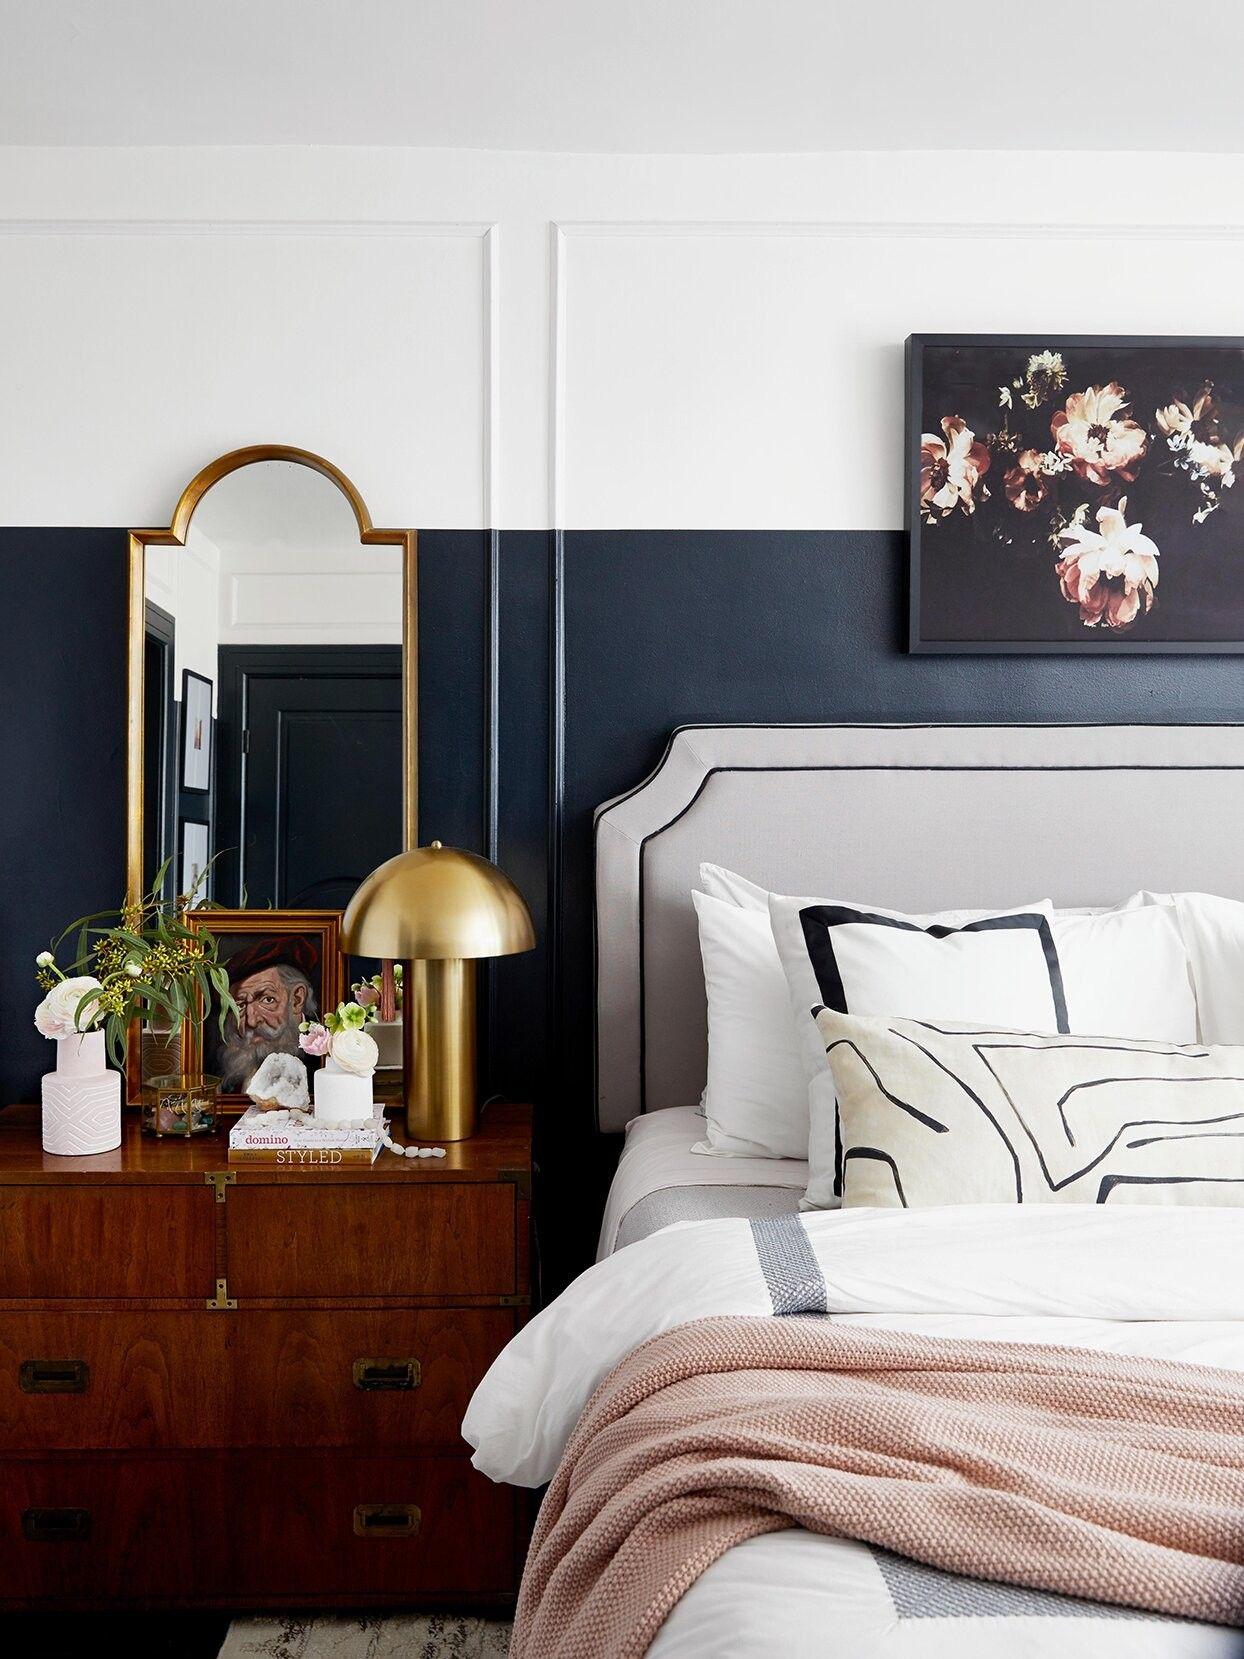 pinchristina clark on home designdecor  white wall